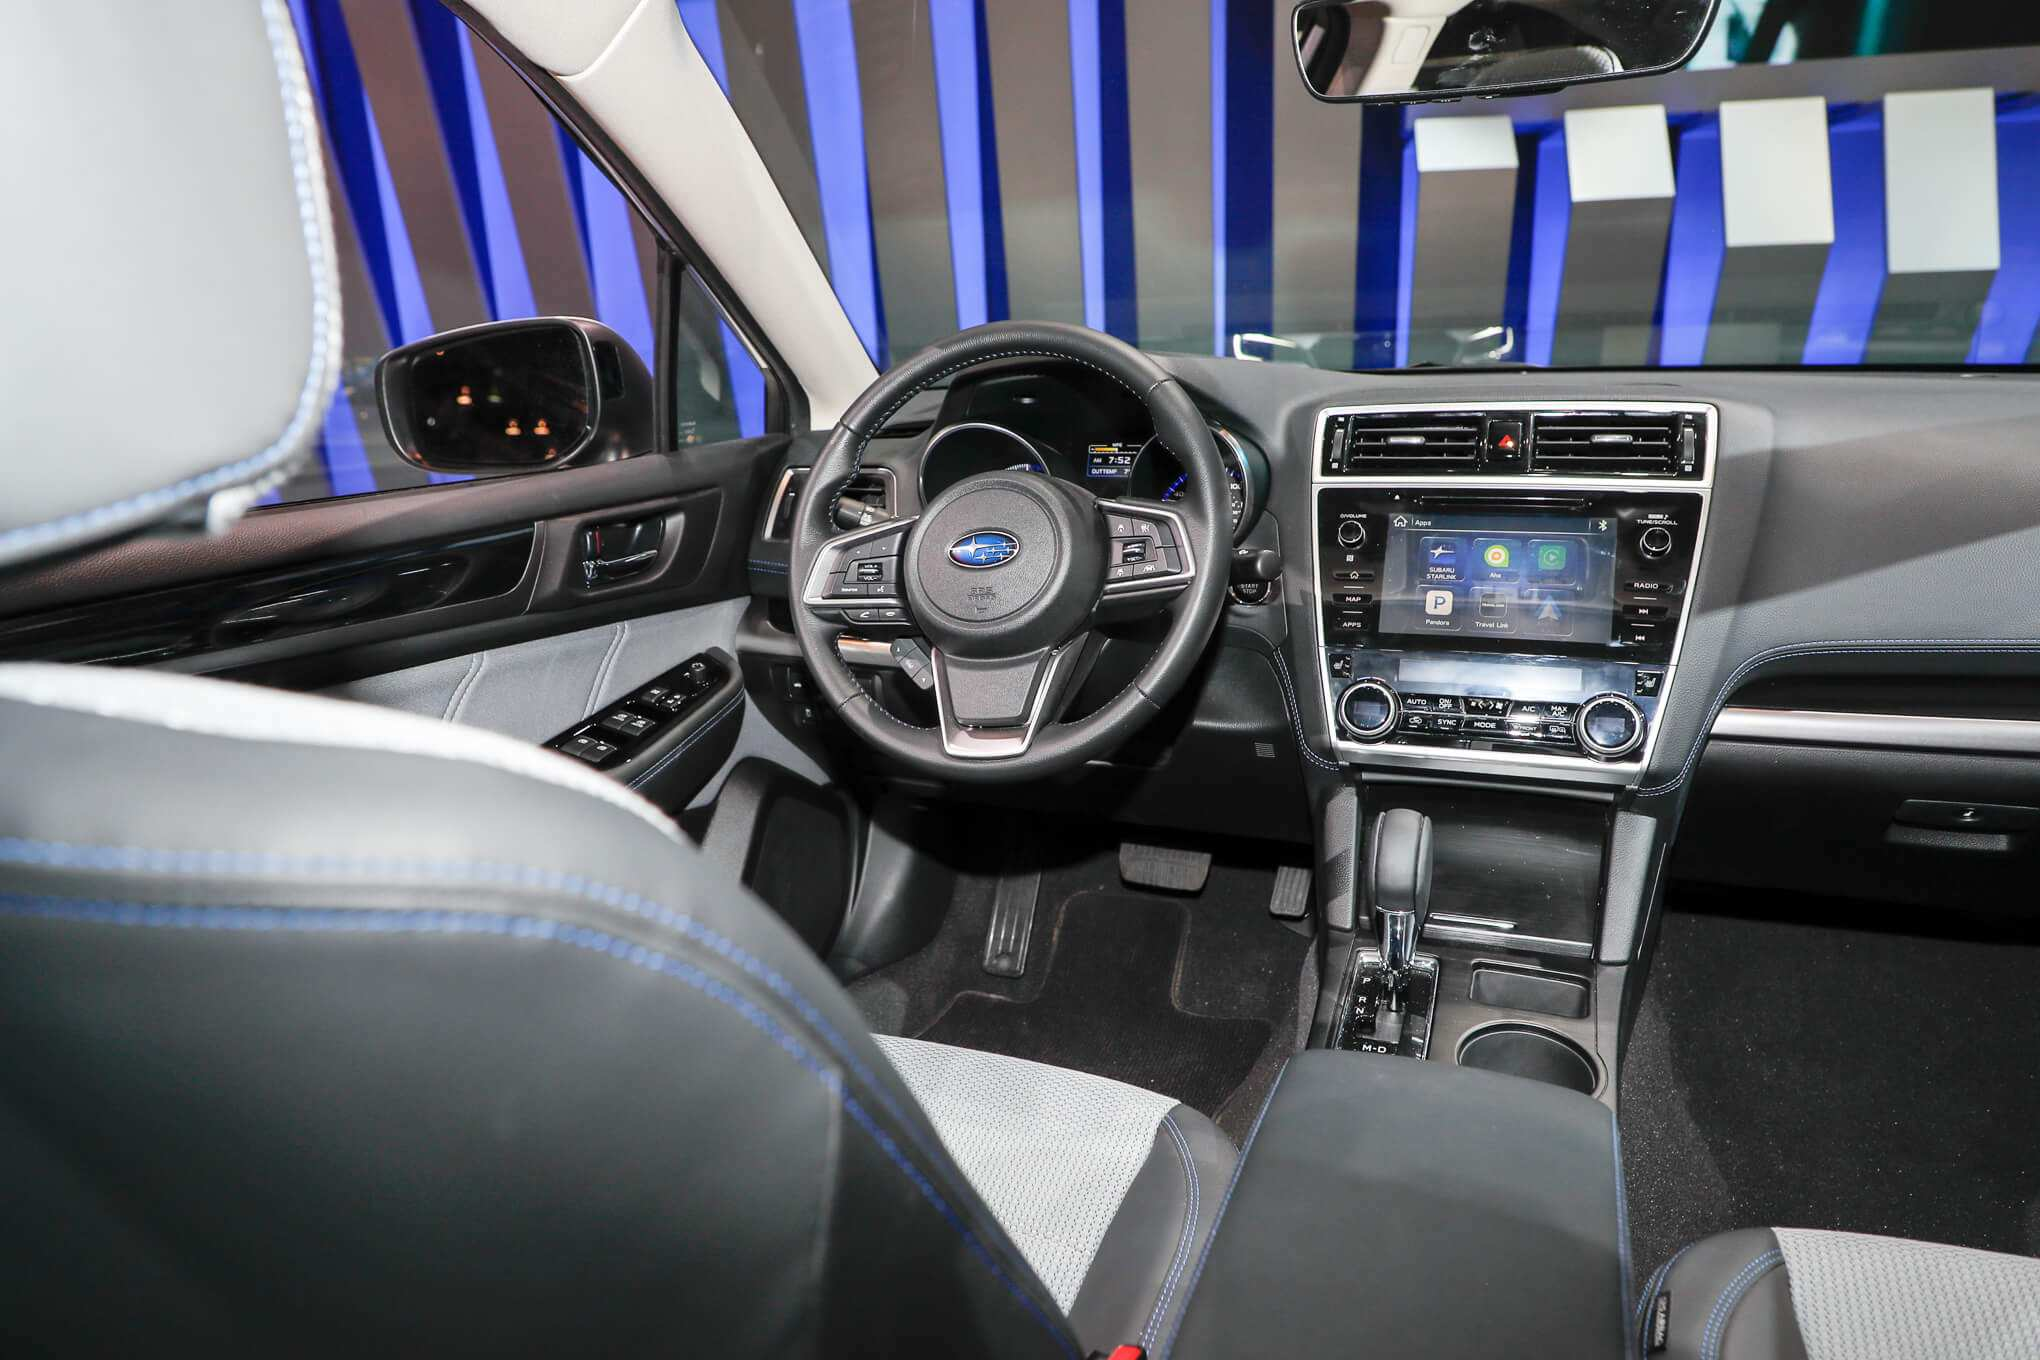 67 All New Subaru Legacy Gt 2020 Configurations with Subaru Legacy Gt 2020